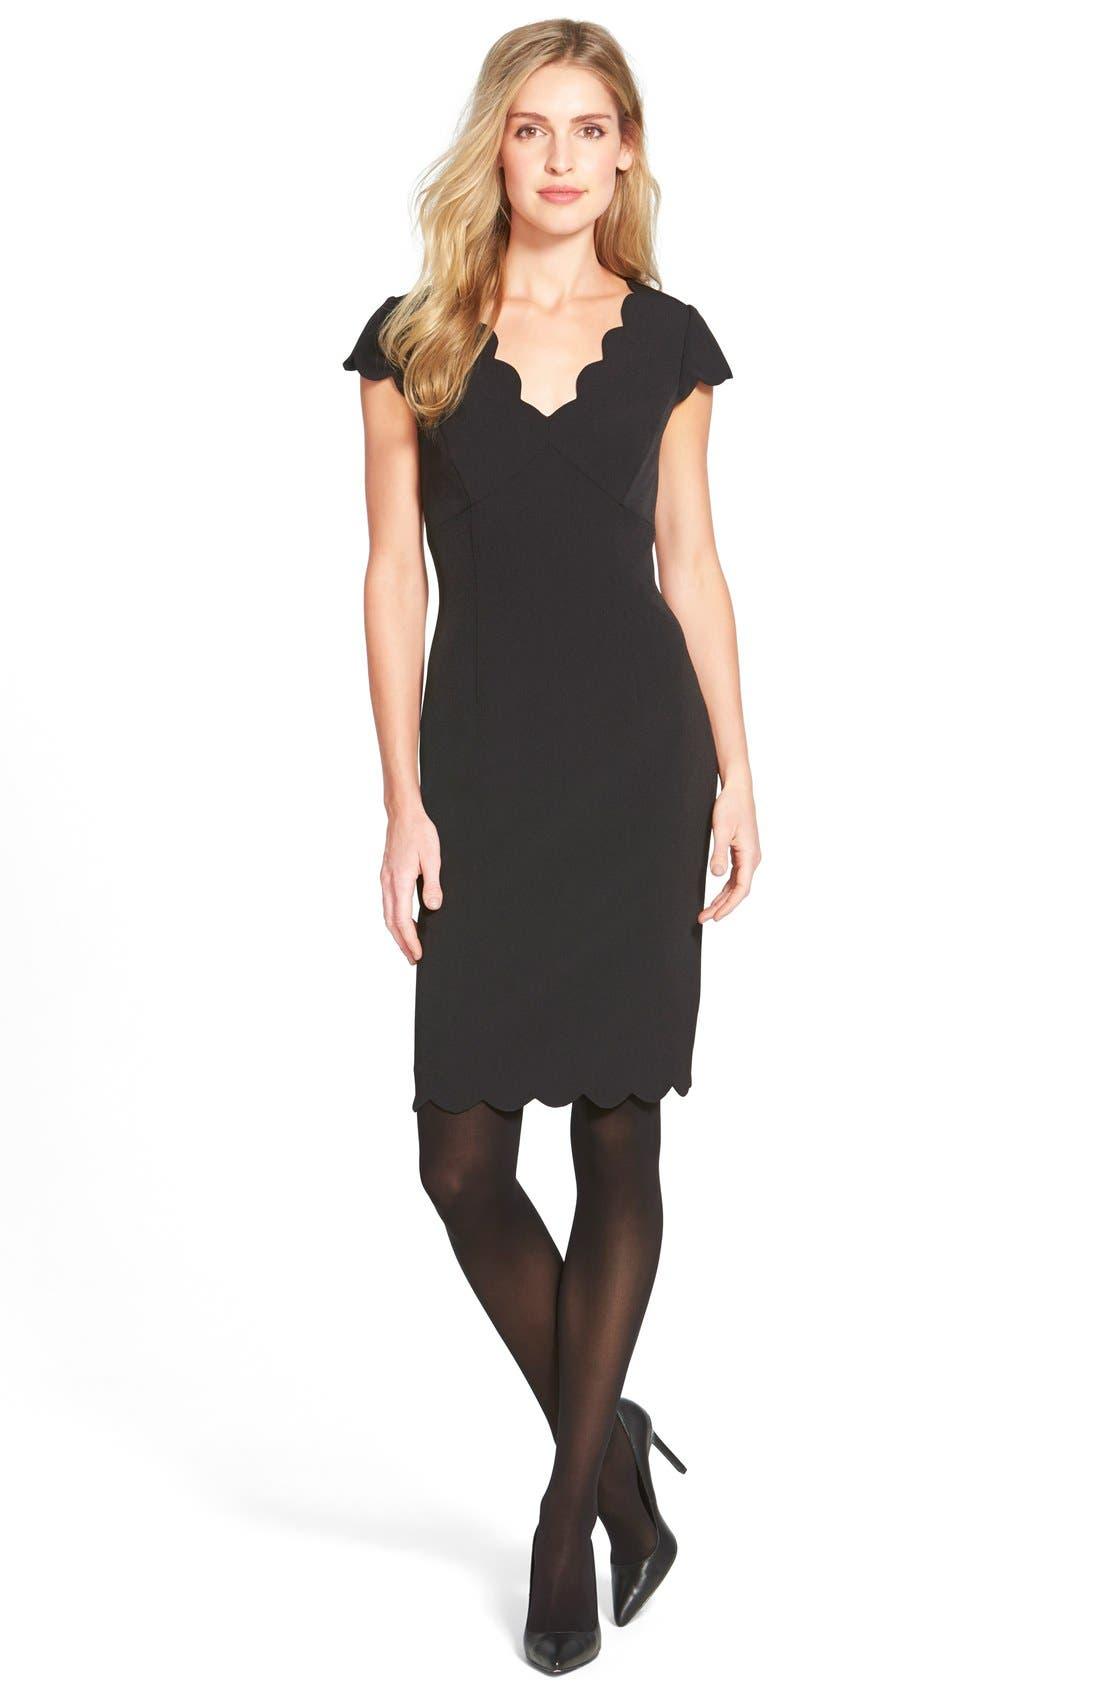 ADRIANNA PAPELL,                             Scalloped Crepe Sheath Dress,                             Alternate thumbnail 9, color,                             001